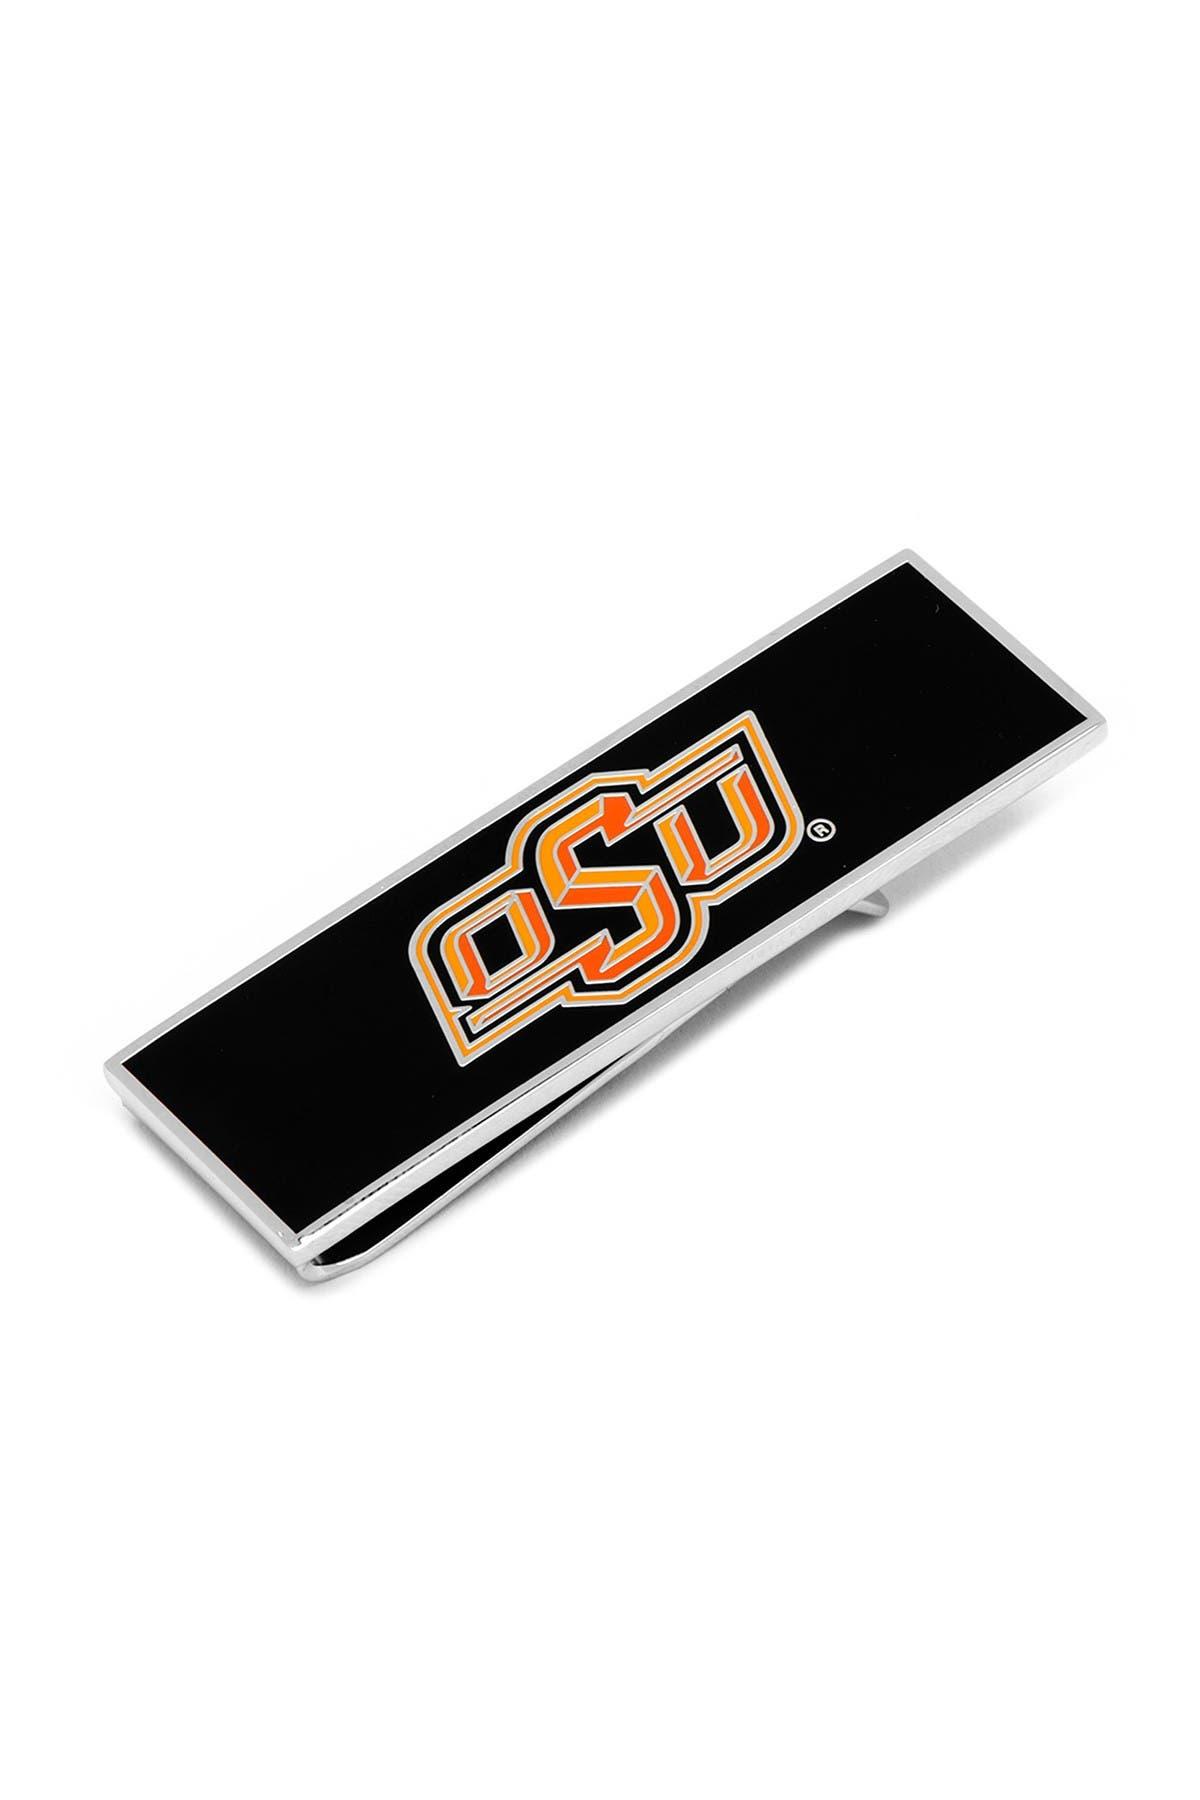 Image of Cufflinks Inc. Oklahoma State Cowboys Money Clip